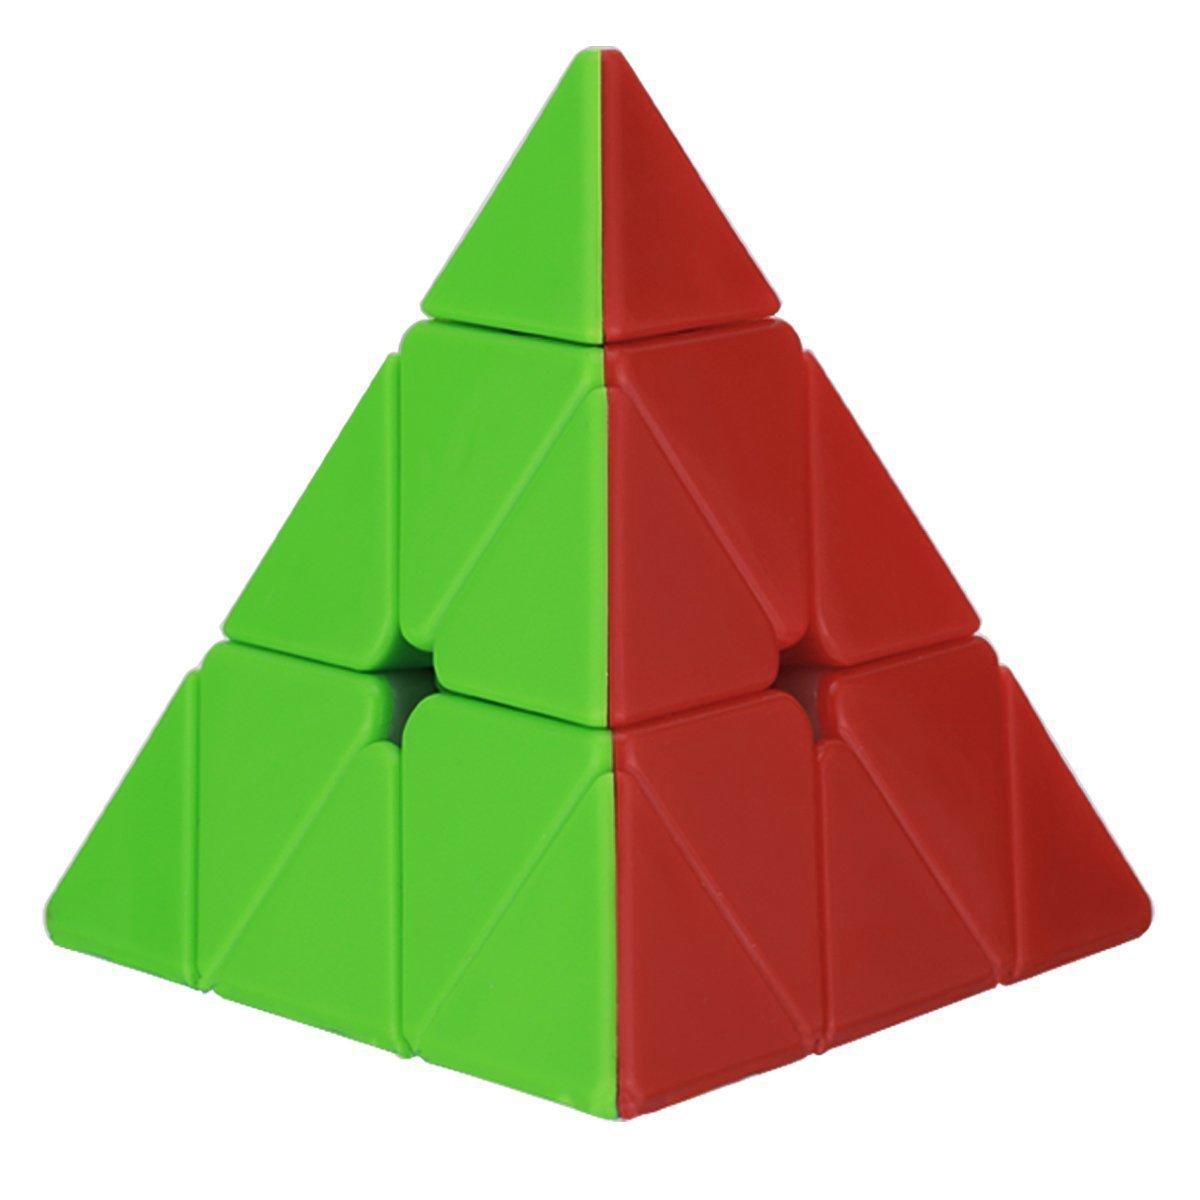 Pyraminx Speed Cube, Dreampark Triangle Dreampark Pyramid Stickerless Stickerless Speed Cube Puzzles - Turns B01GYL5T36, kireio:c6ced603 --- m2cweb.com